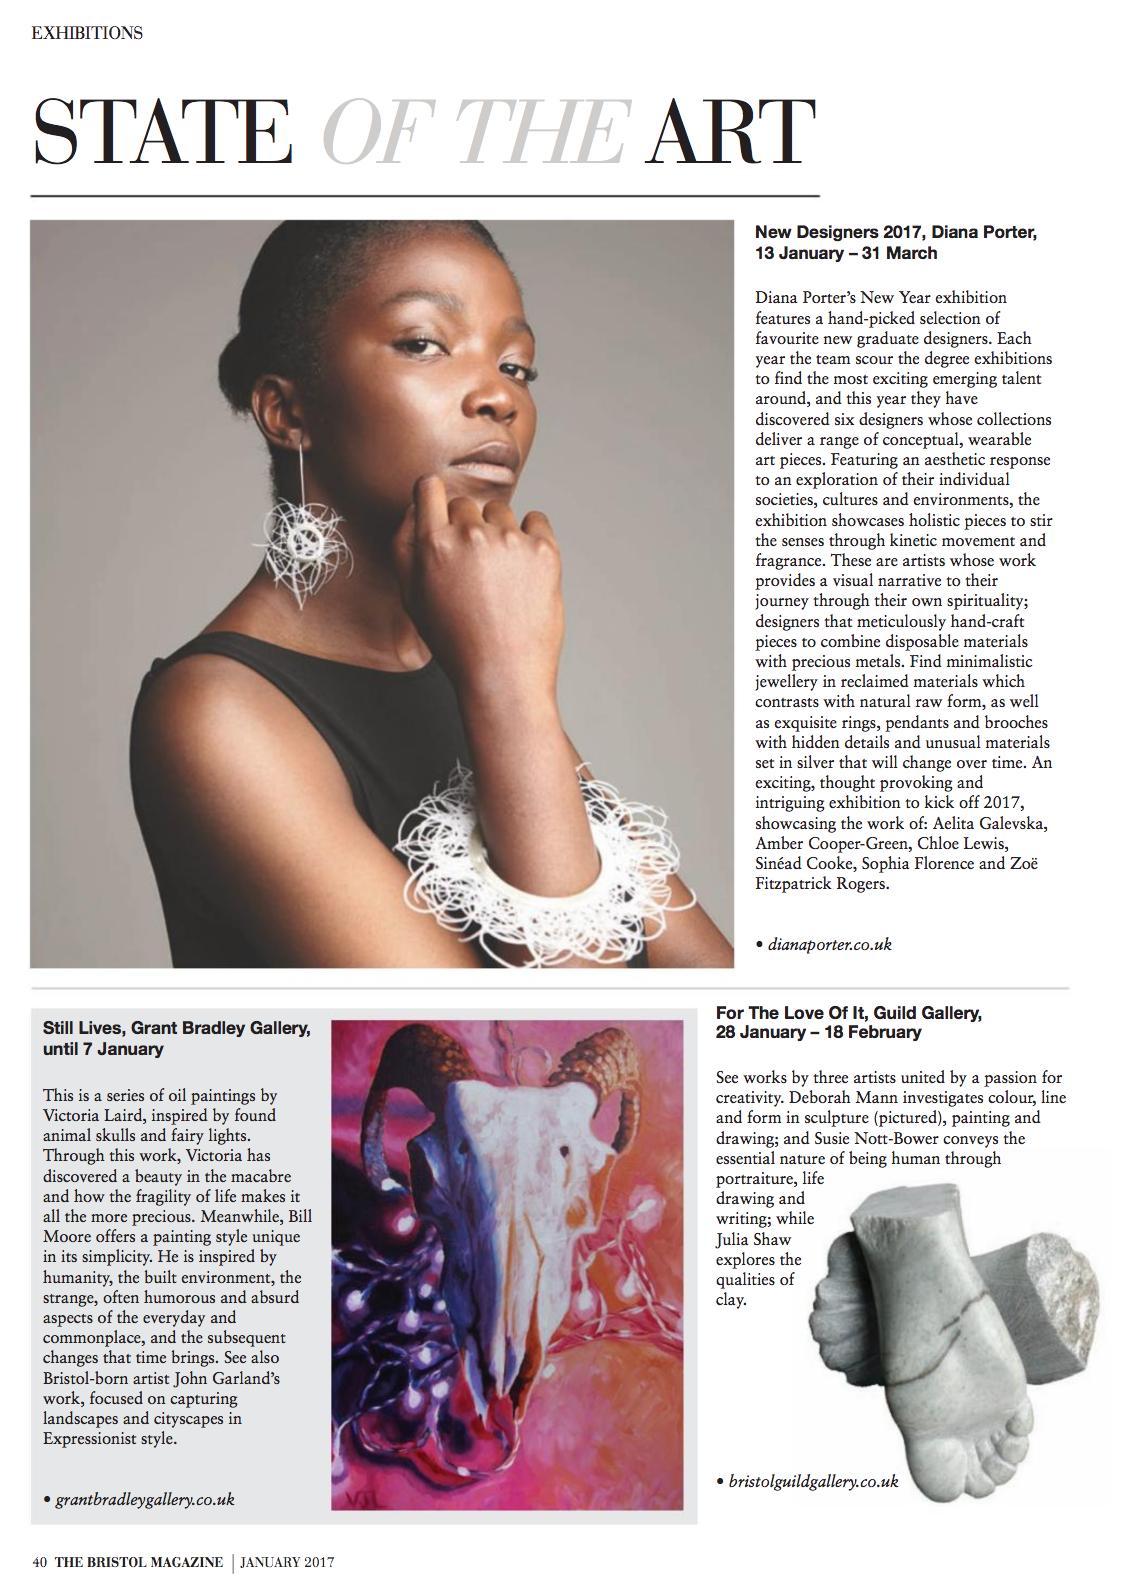 diana porter bristol magazine january 2017